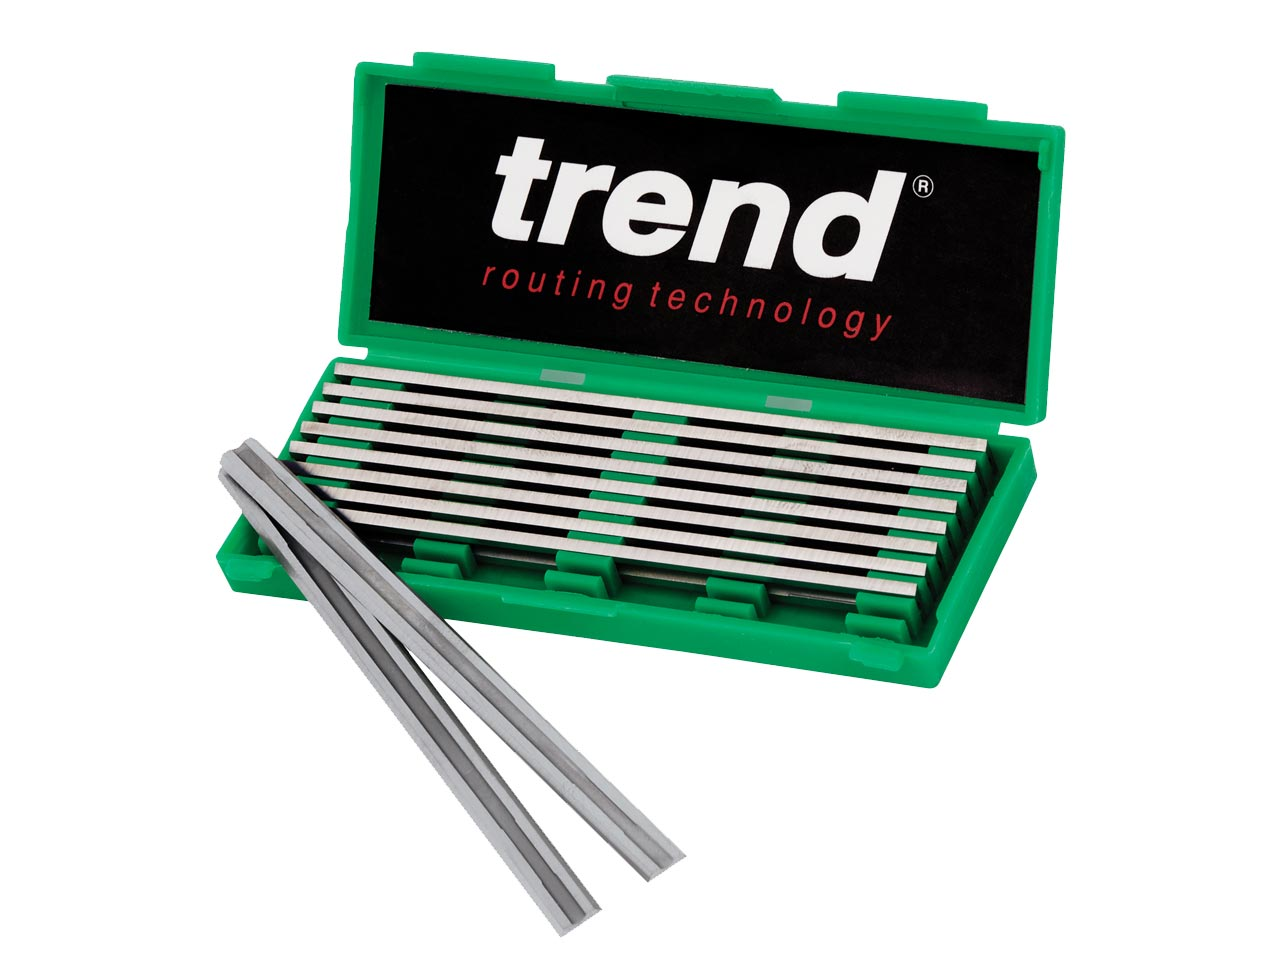 Trend_CRPB295PR.jpg